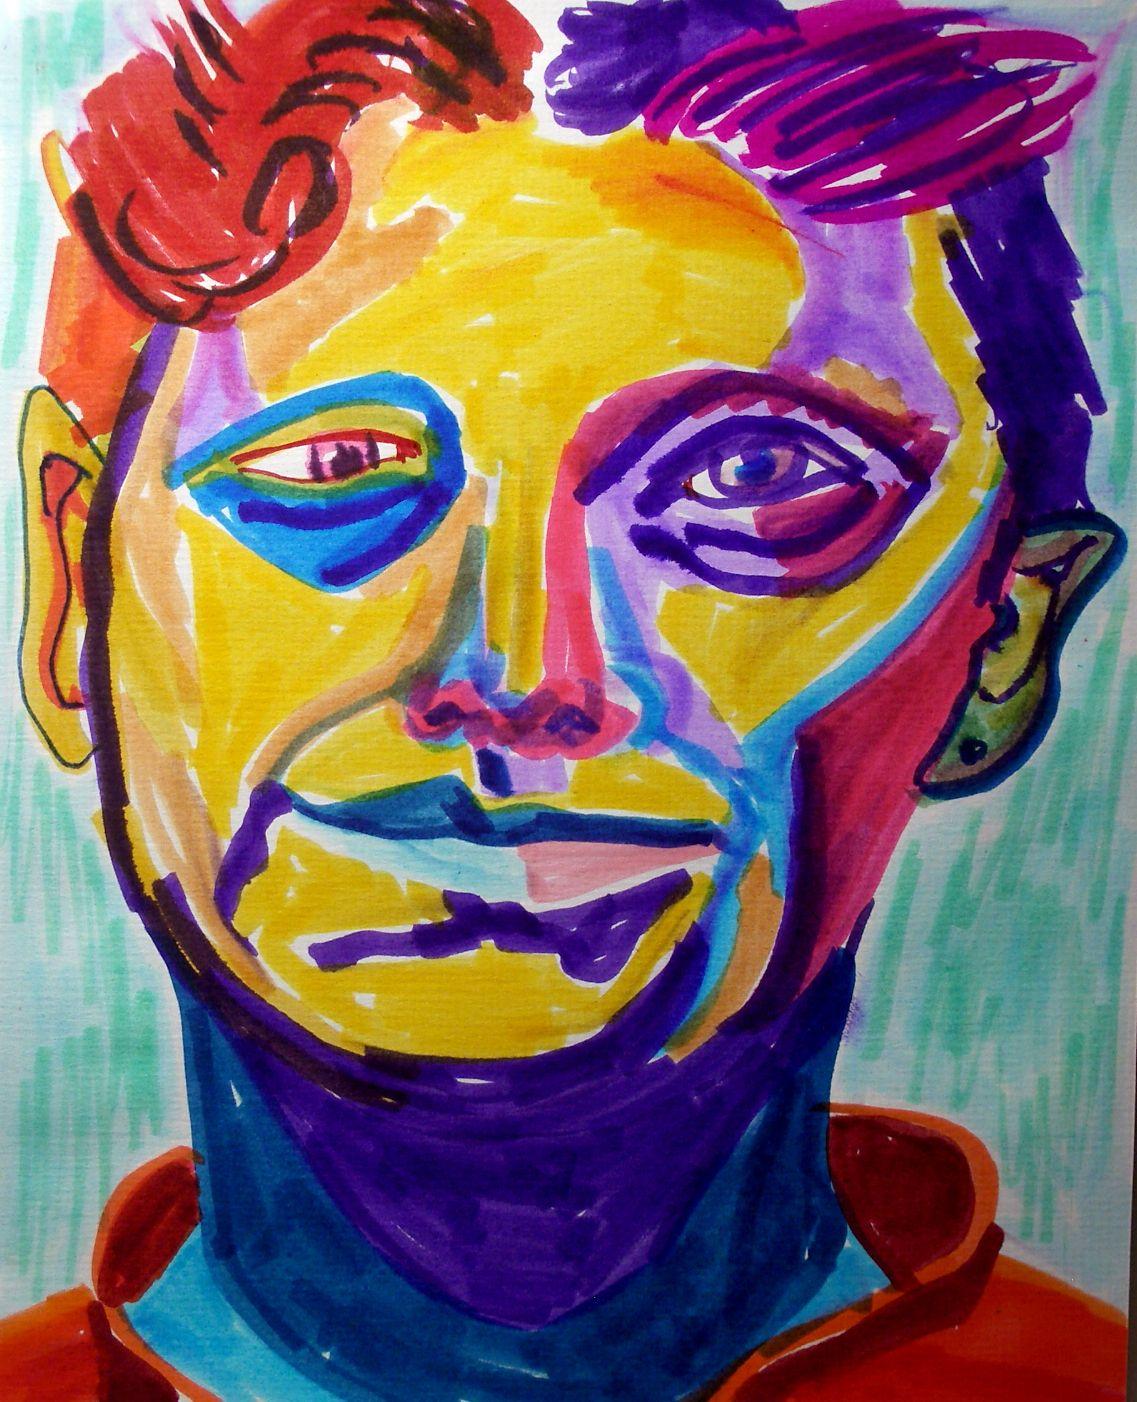 Henri+Matisse | ... but the emotion it produces upon me henri ...